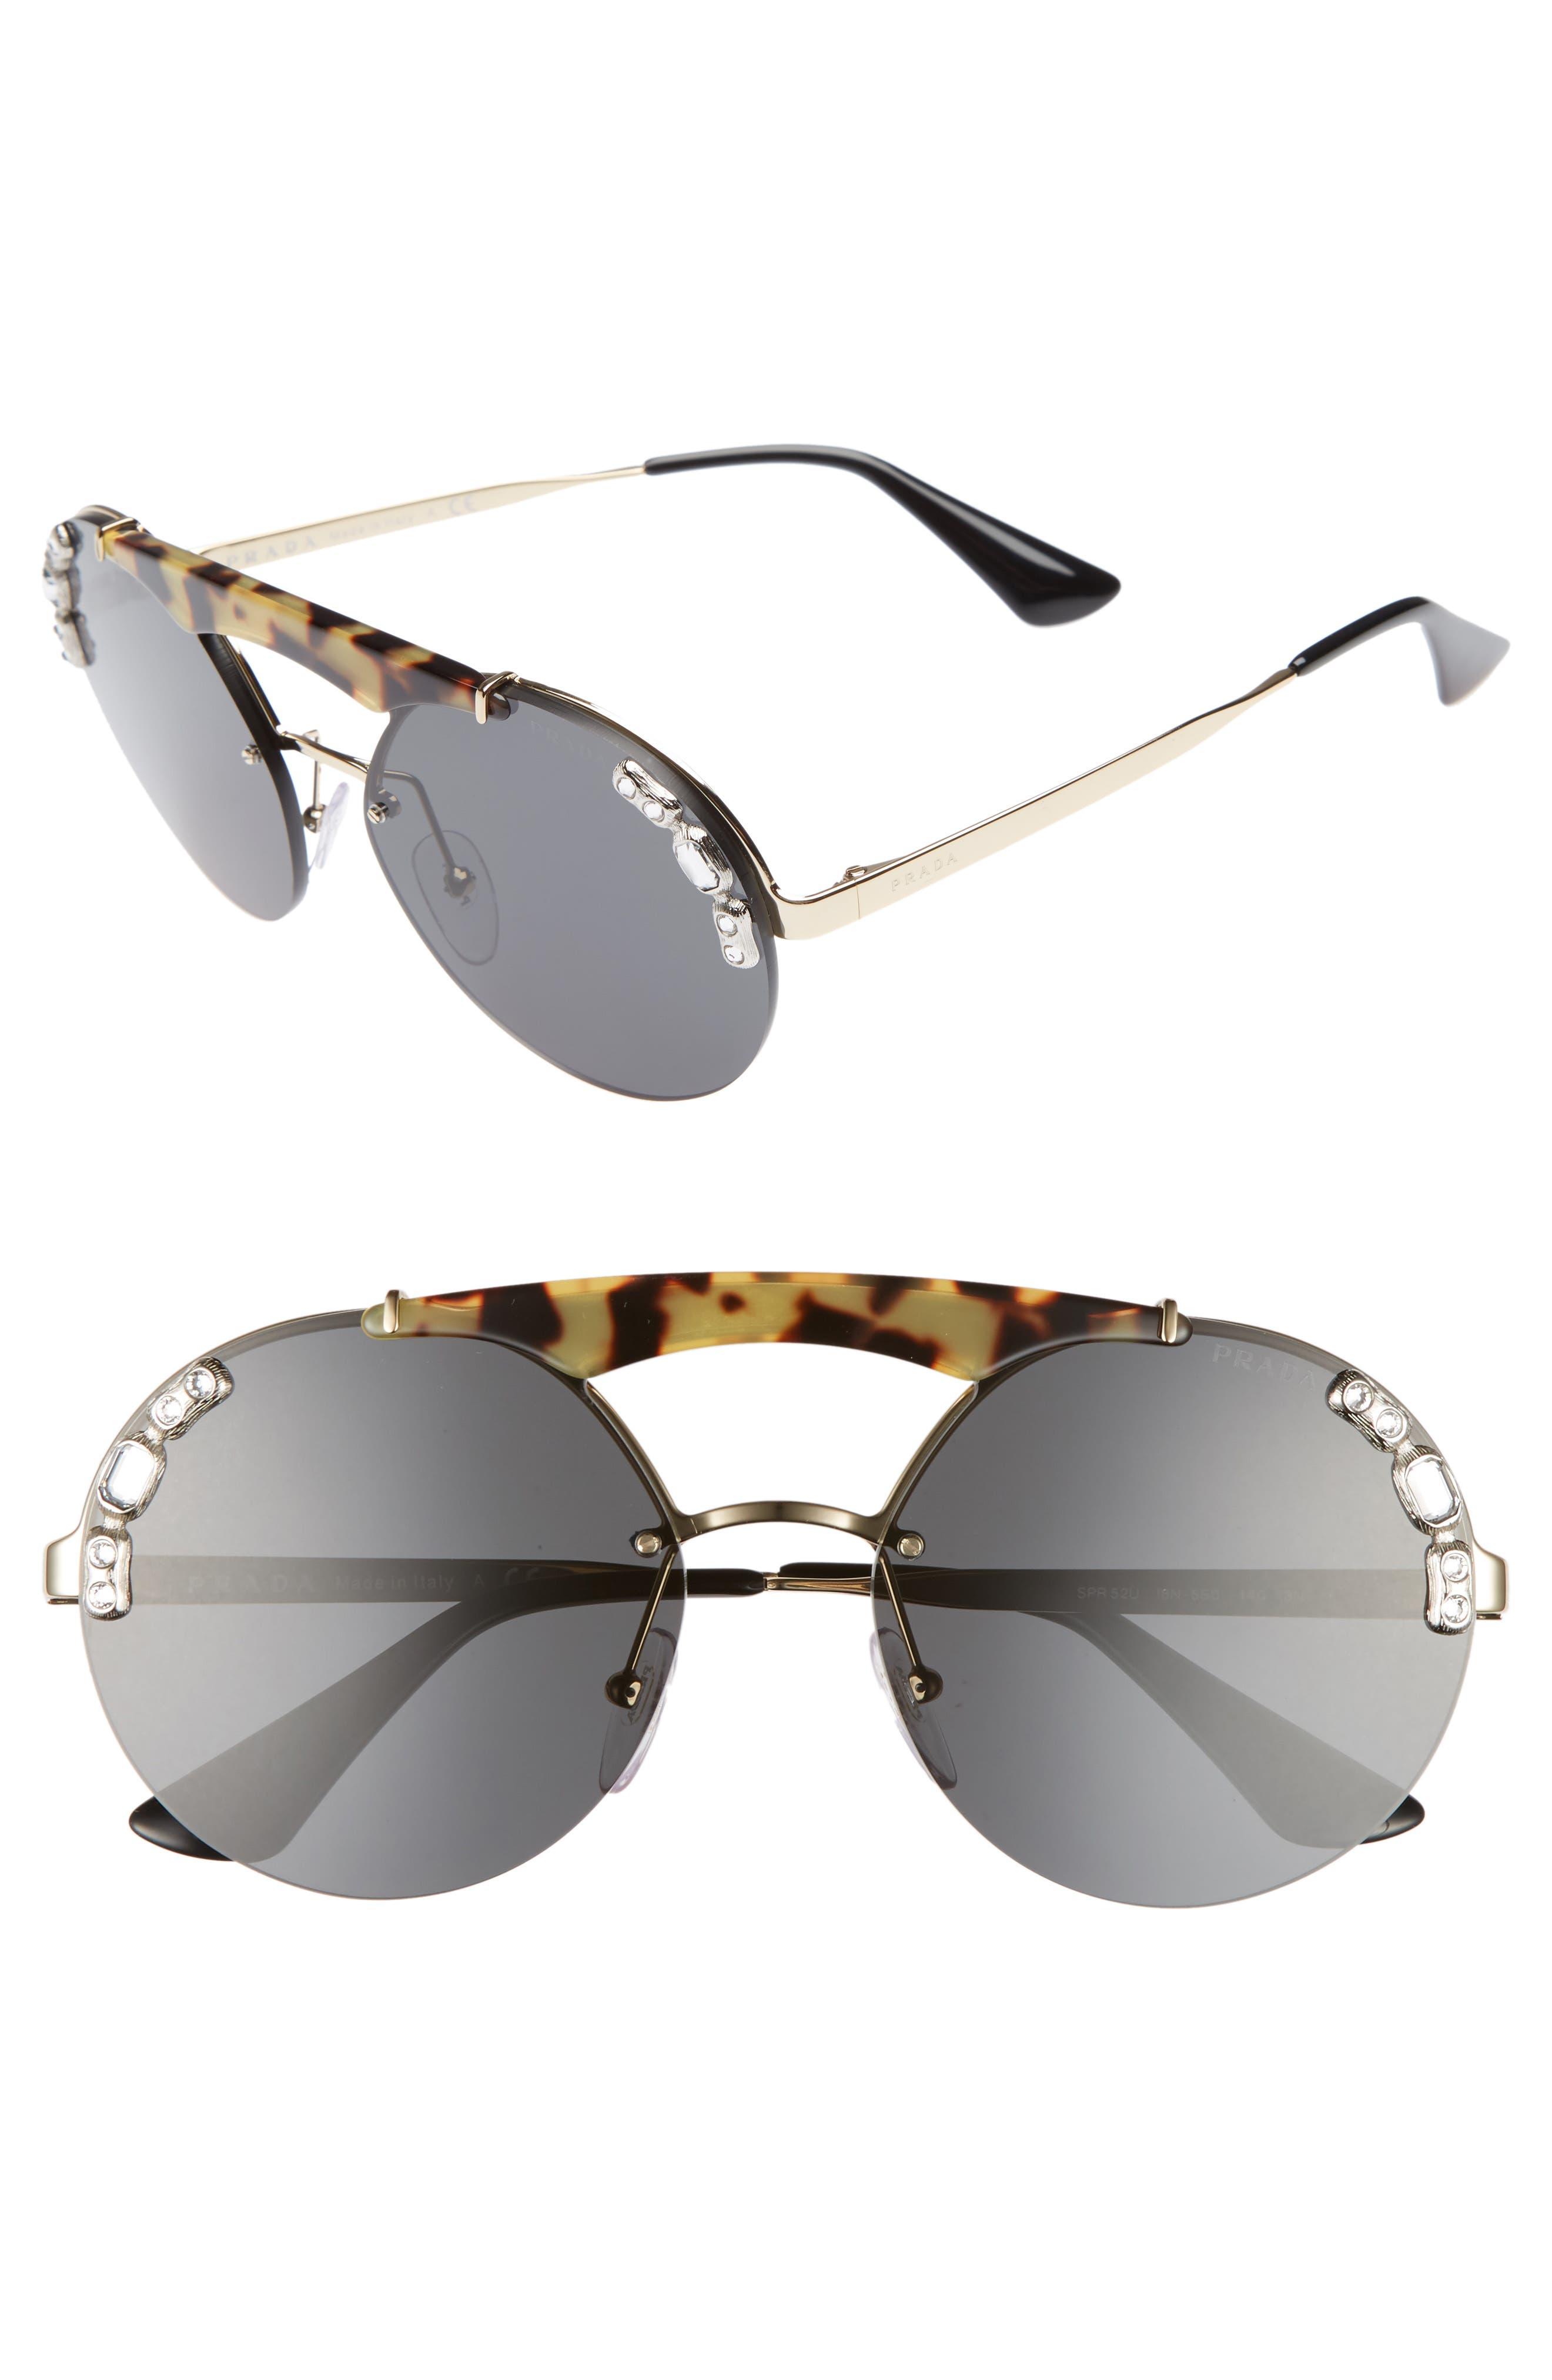 Alternate Image 1 Selected - Prada 52mm Embellished Round Rimless Sunglasses